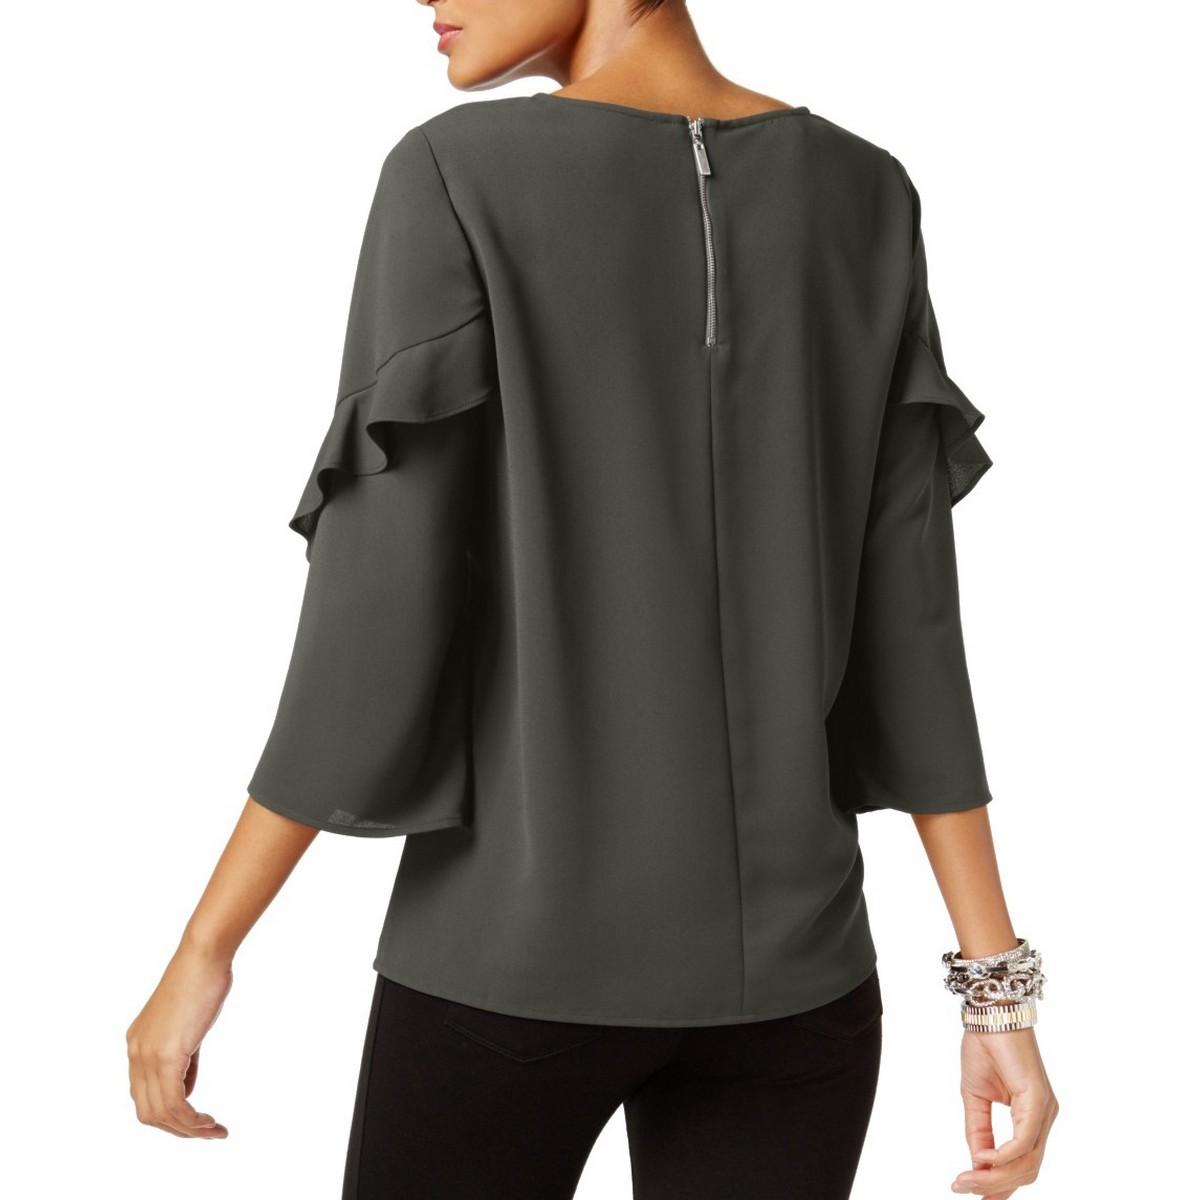 ALFANI-NEW-Women-039-s-3-4-Ruffled-sleeve-Zip-back-Blouse-Shirt-Top-TEDO thumbnail 7